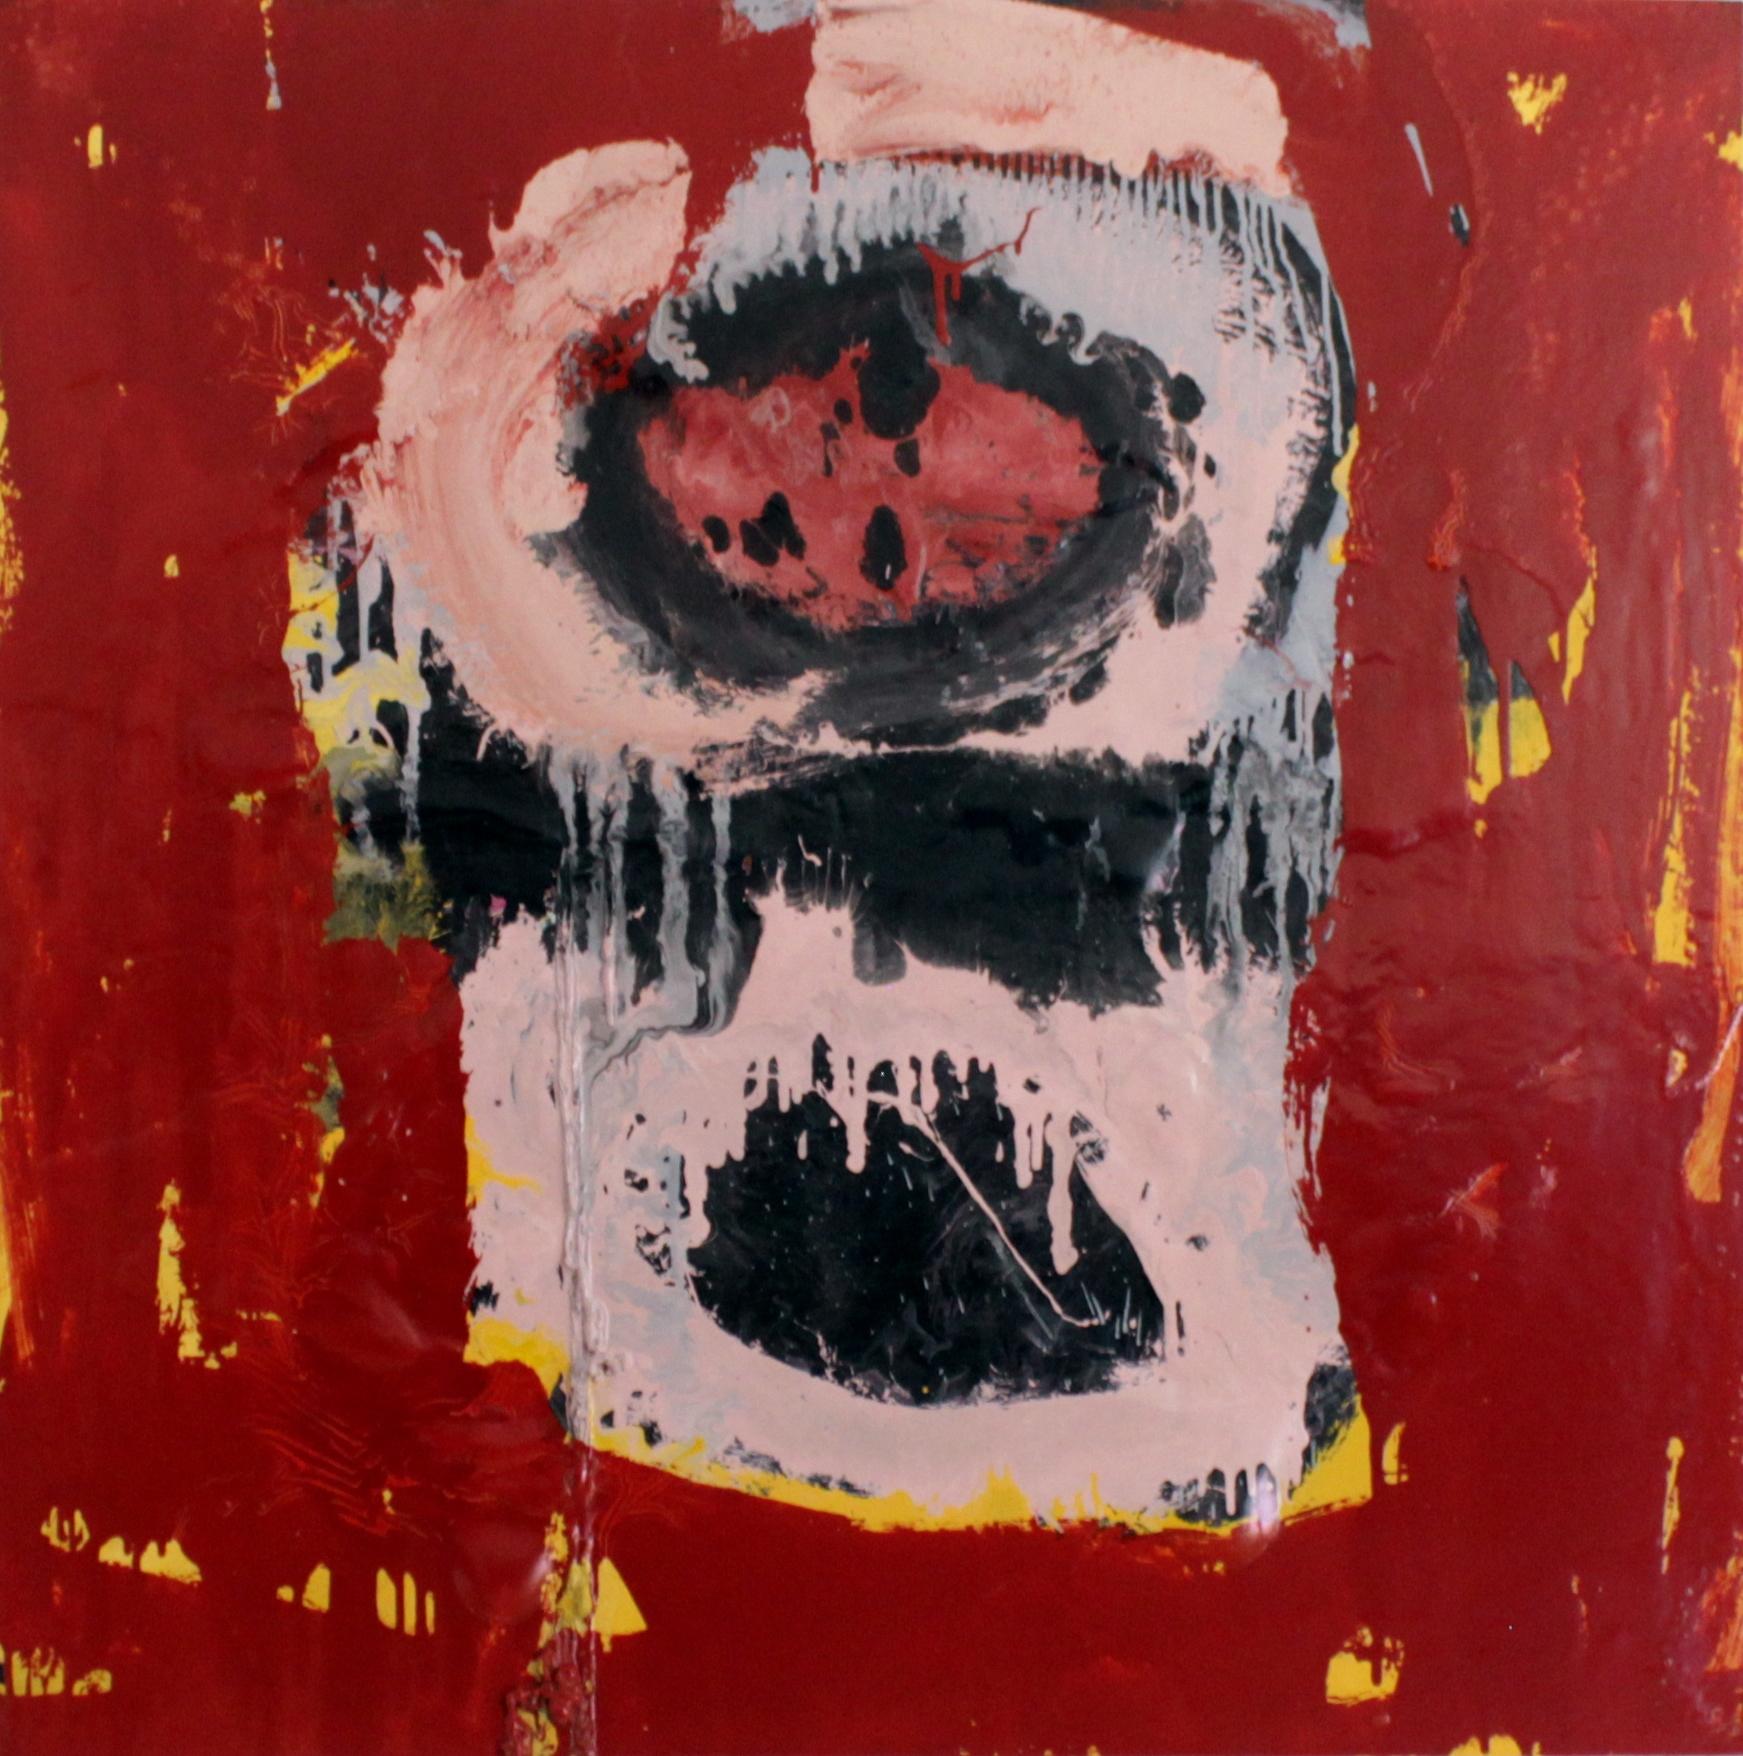 Untitled, 2016, enamel paint on canvas, 122 x 122 cm